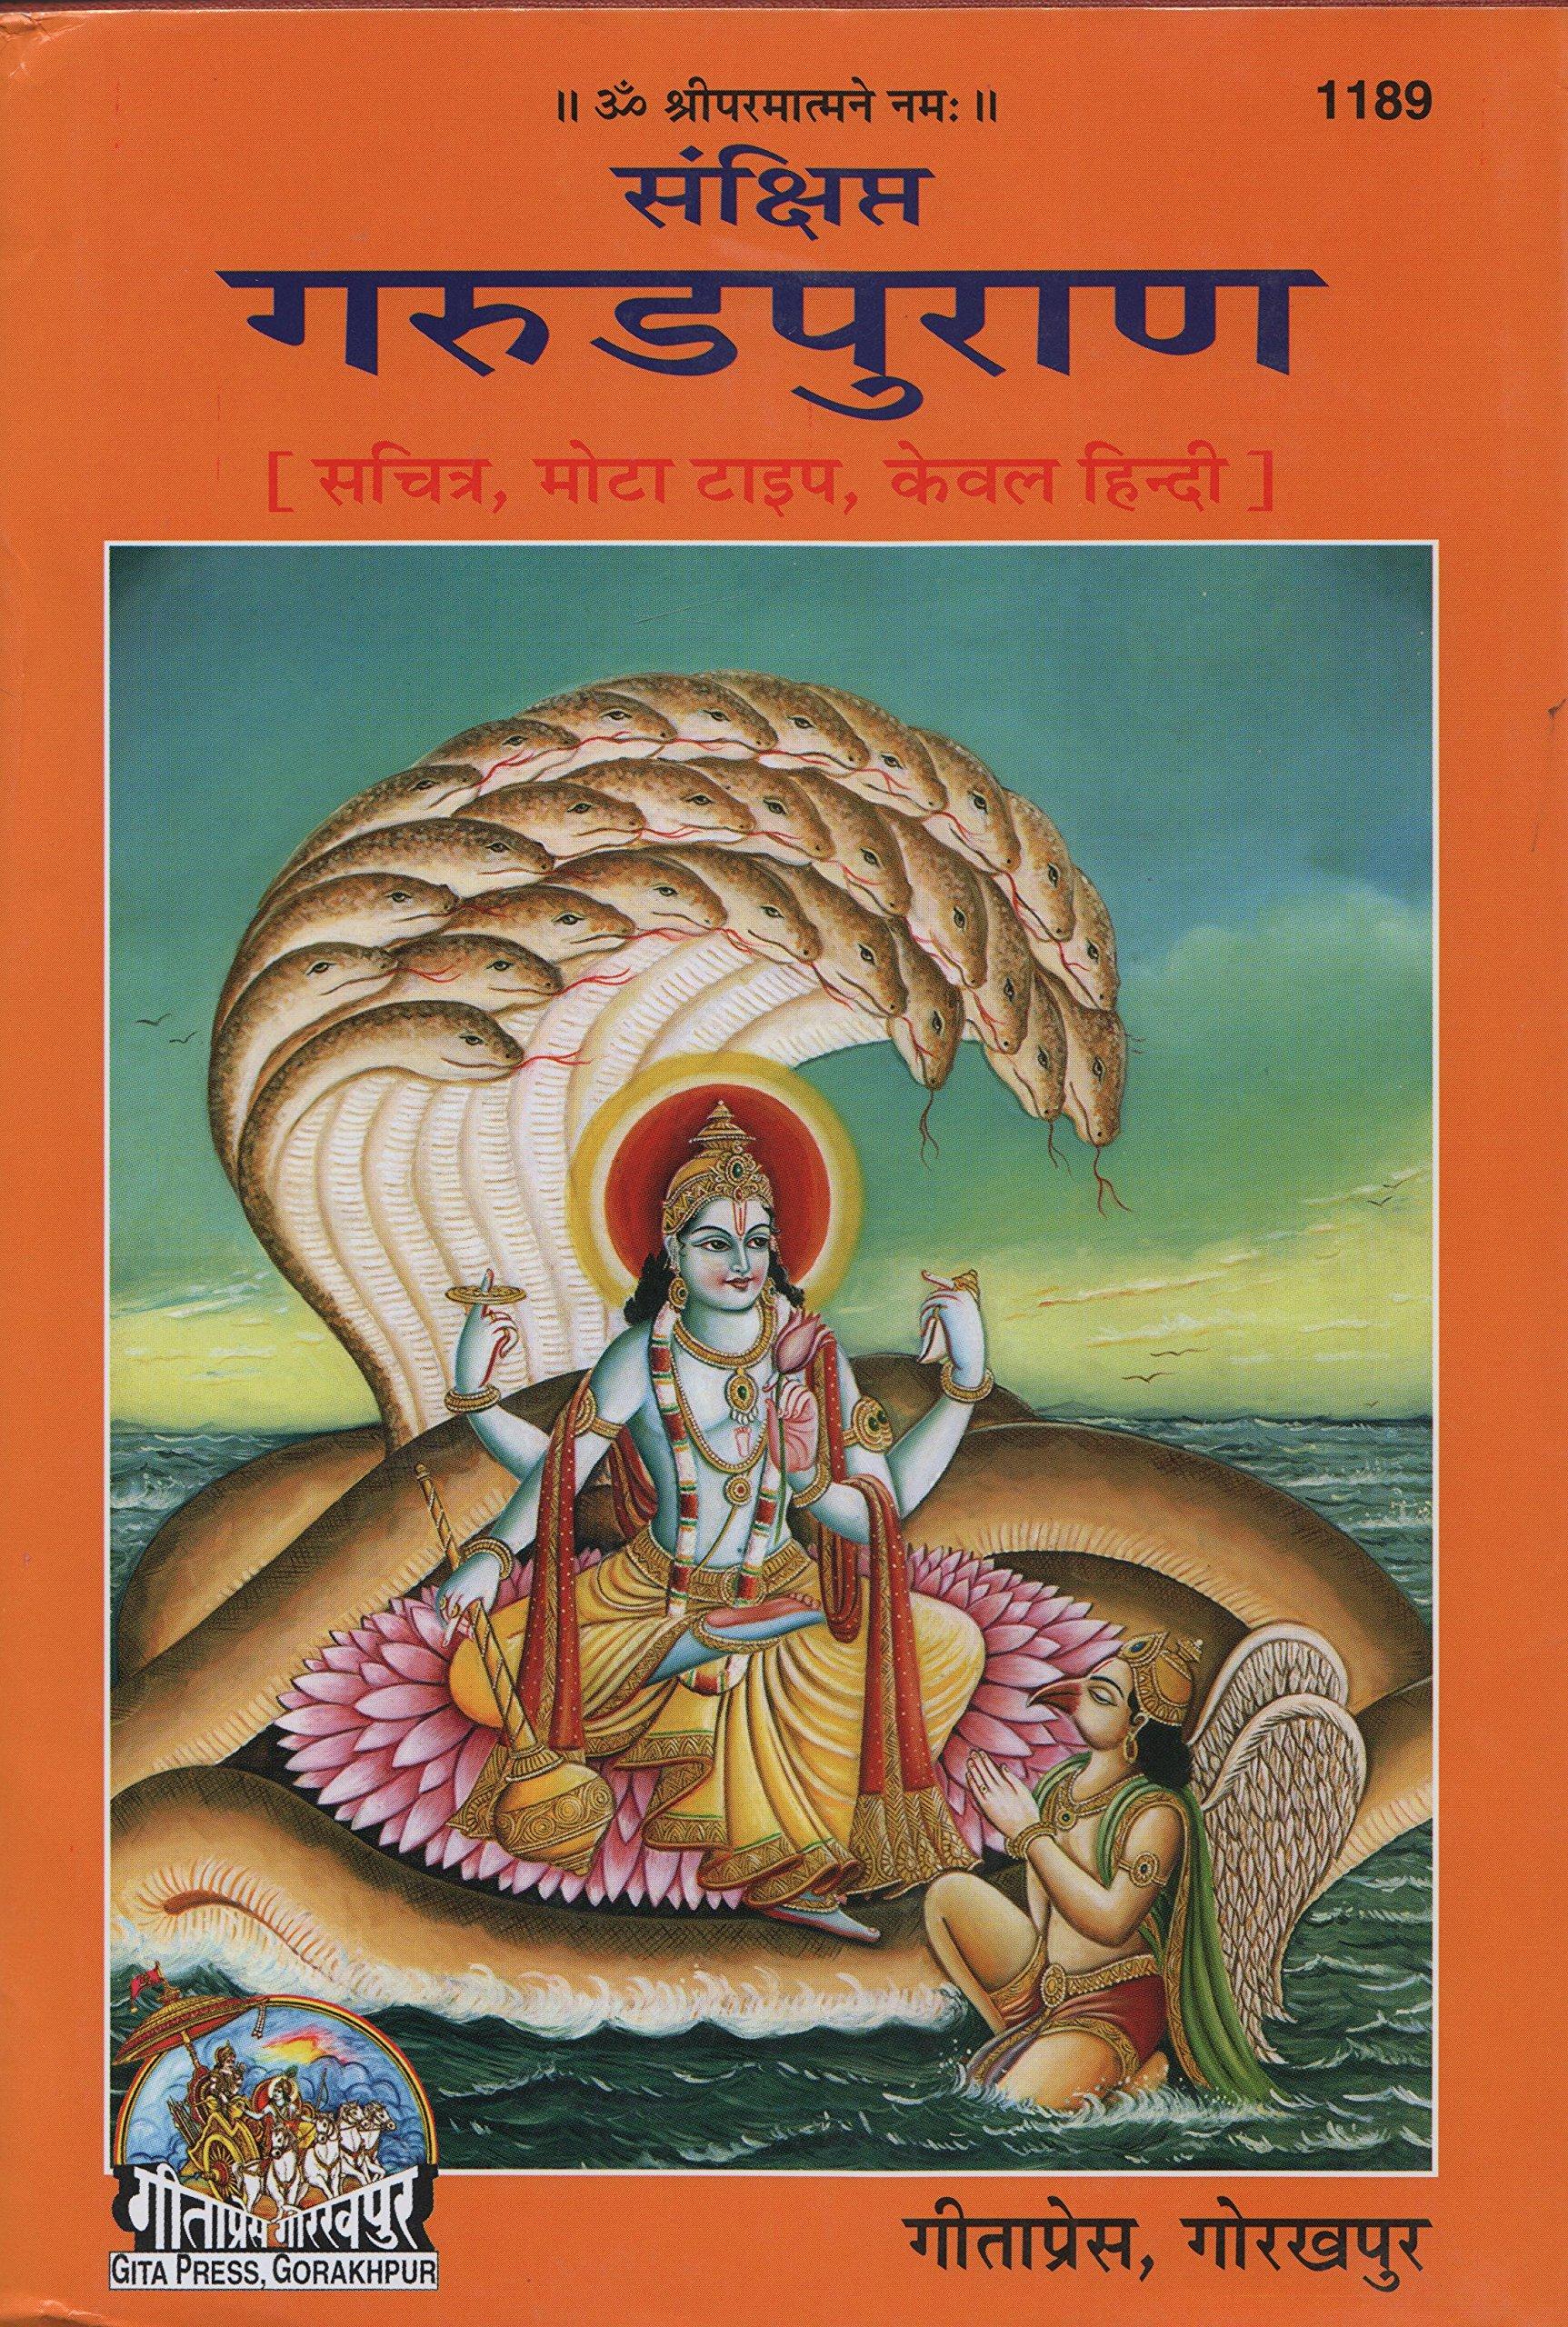 Amazon buy shri vishnu puran code 48 book online at low prices samkshipt garud puran code 1189 fandeluxe Gallery